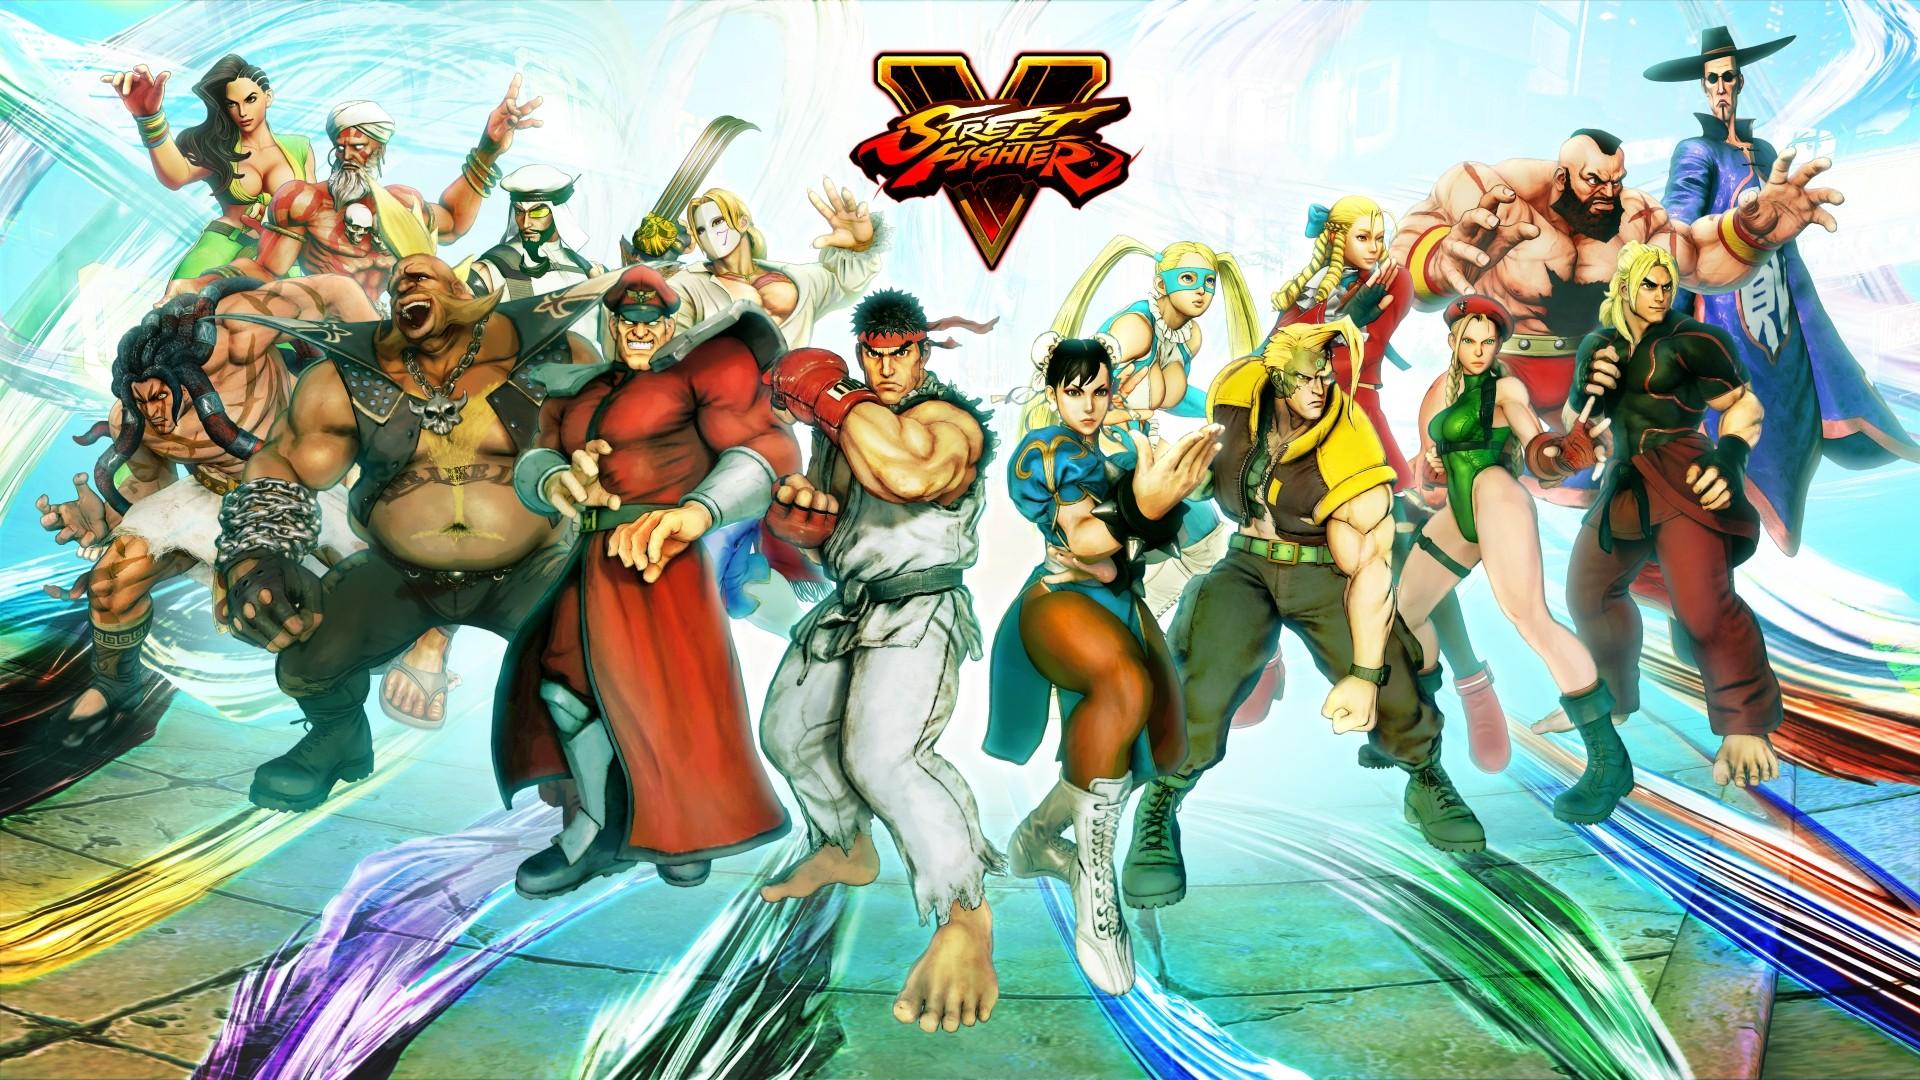 Street Fighter 5 Wallpaper Download Free Stunning Wallpapers